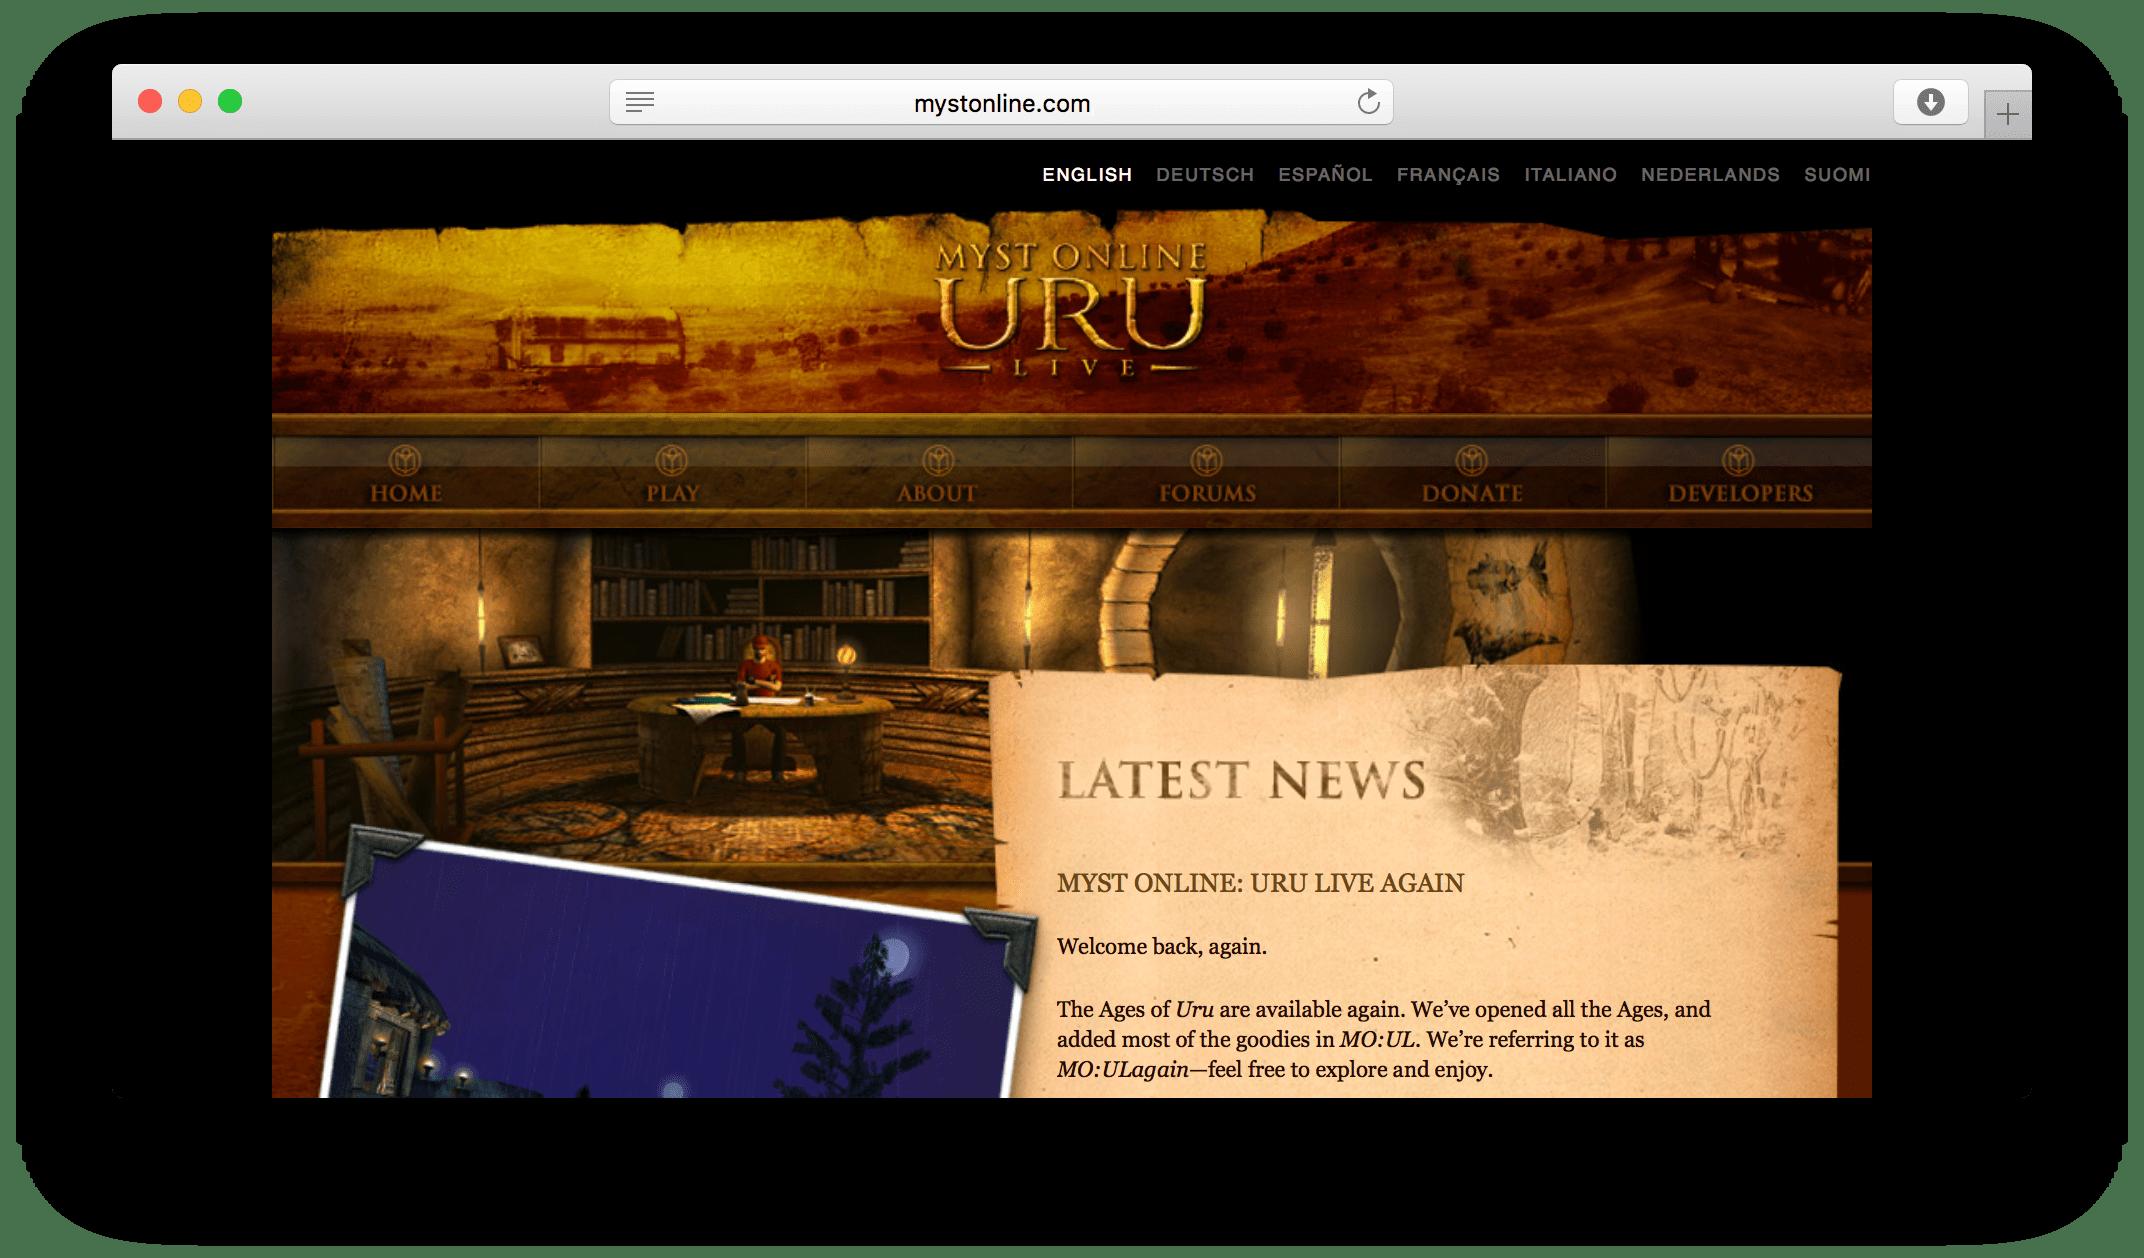 Myst Online website screenshot